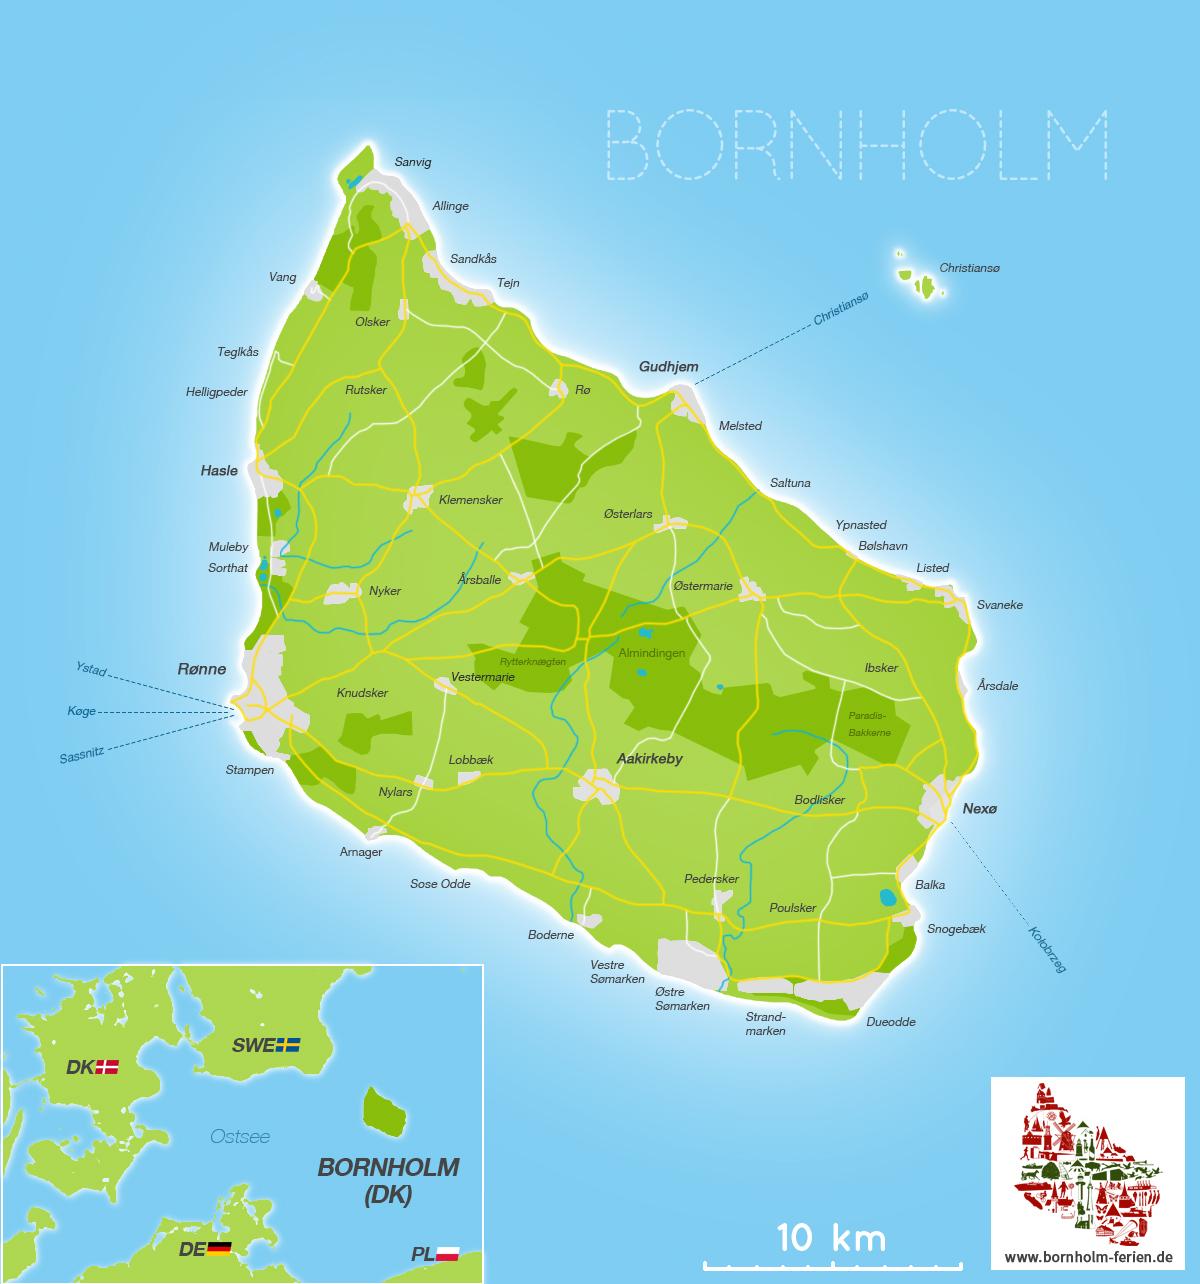 Lage Grosse Insel Bornholm Danemark Ostsee Bornholm Ferien De